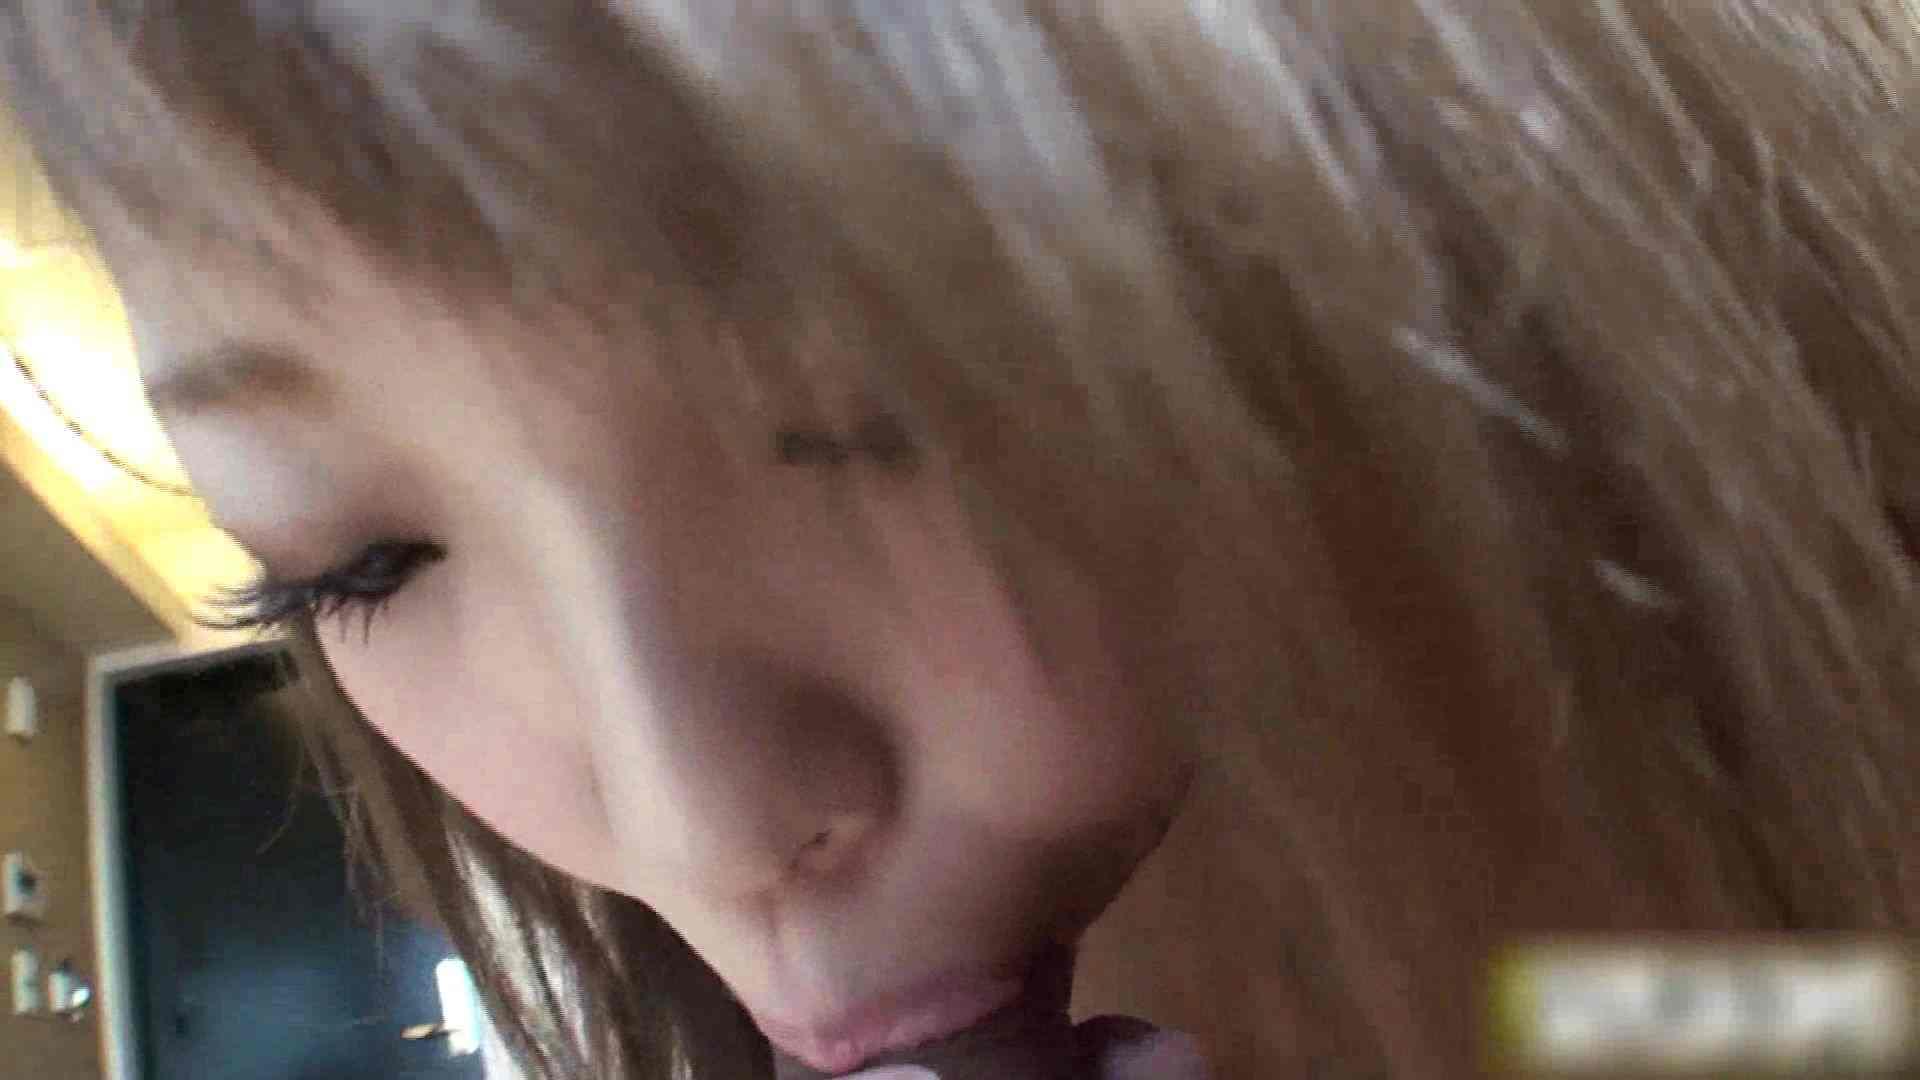 S級厳選美女ビッチガールVol.34 OLエロ画像  105PICs 60